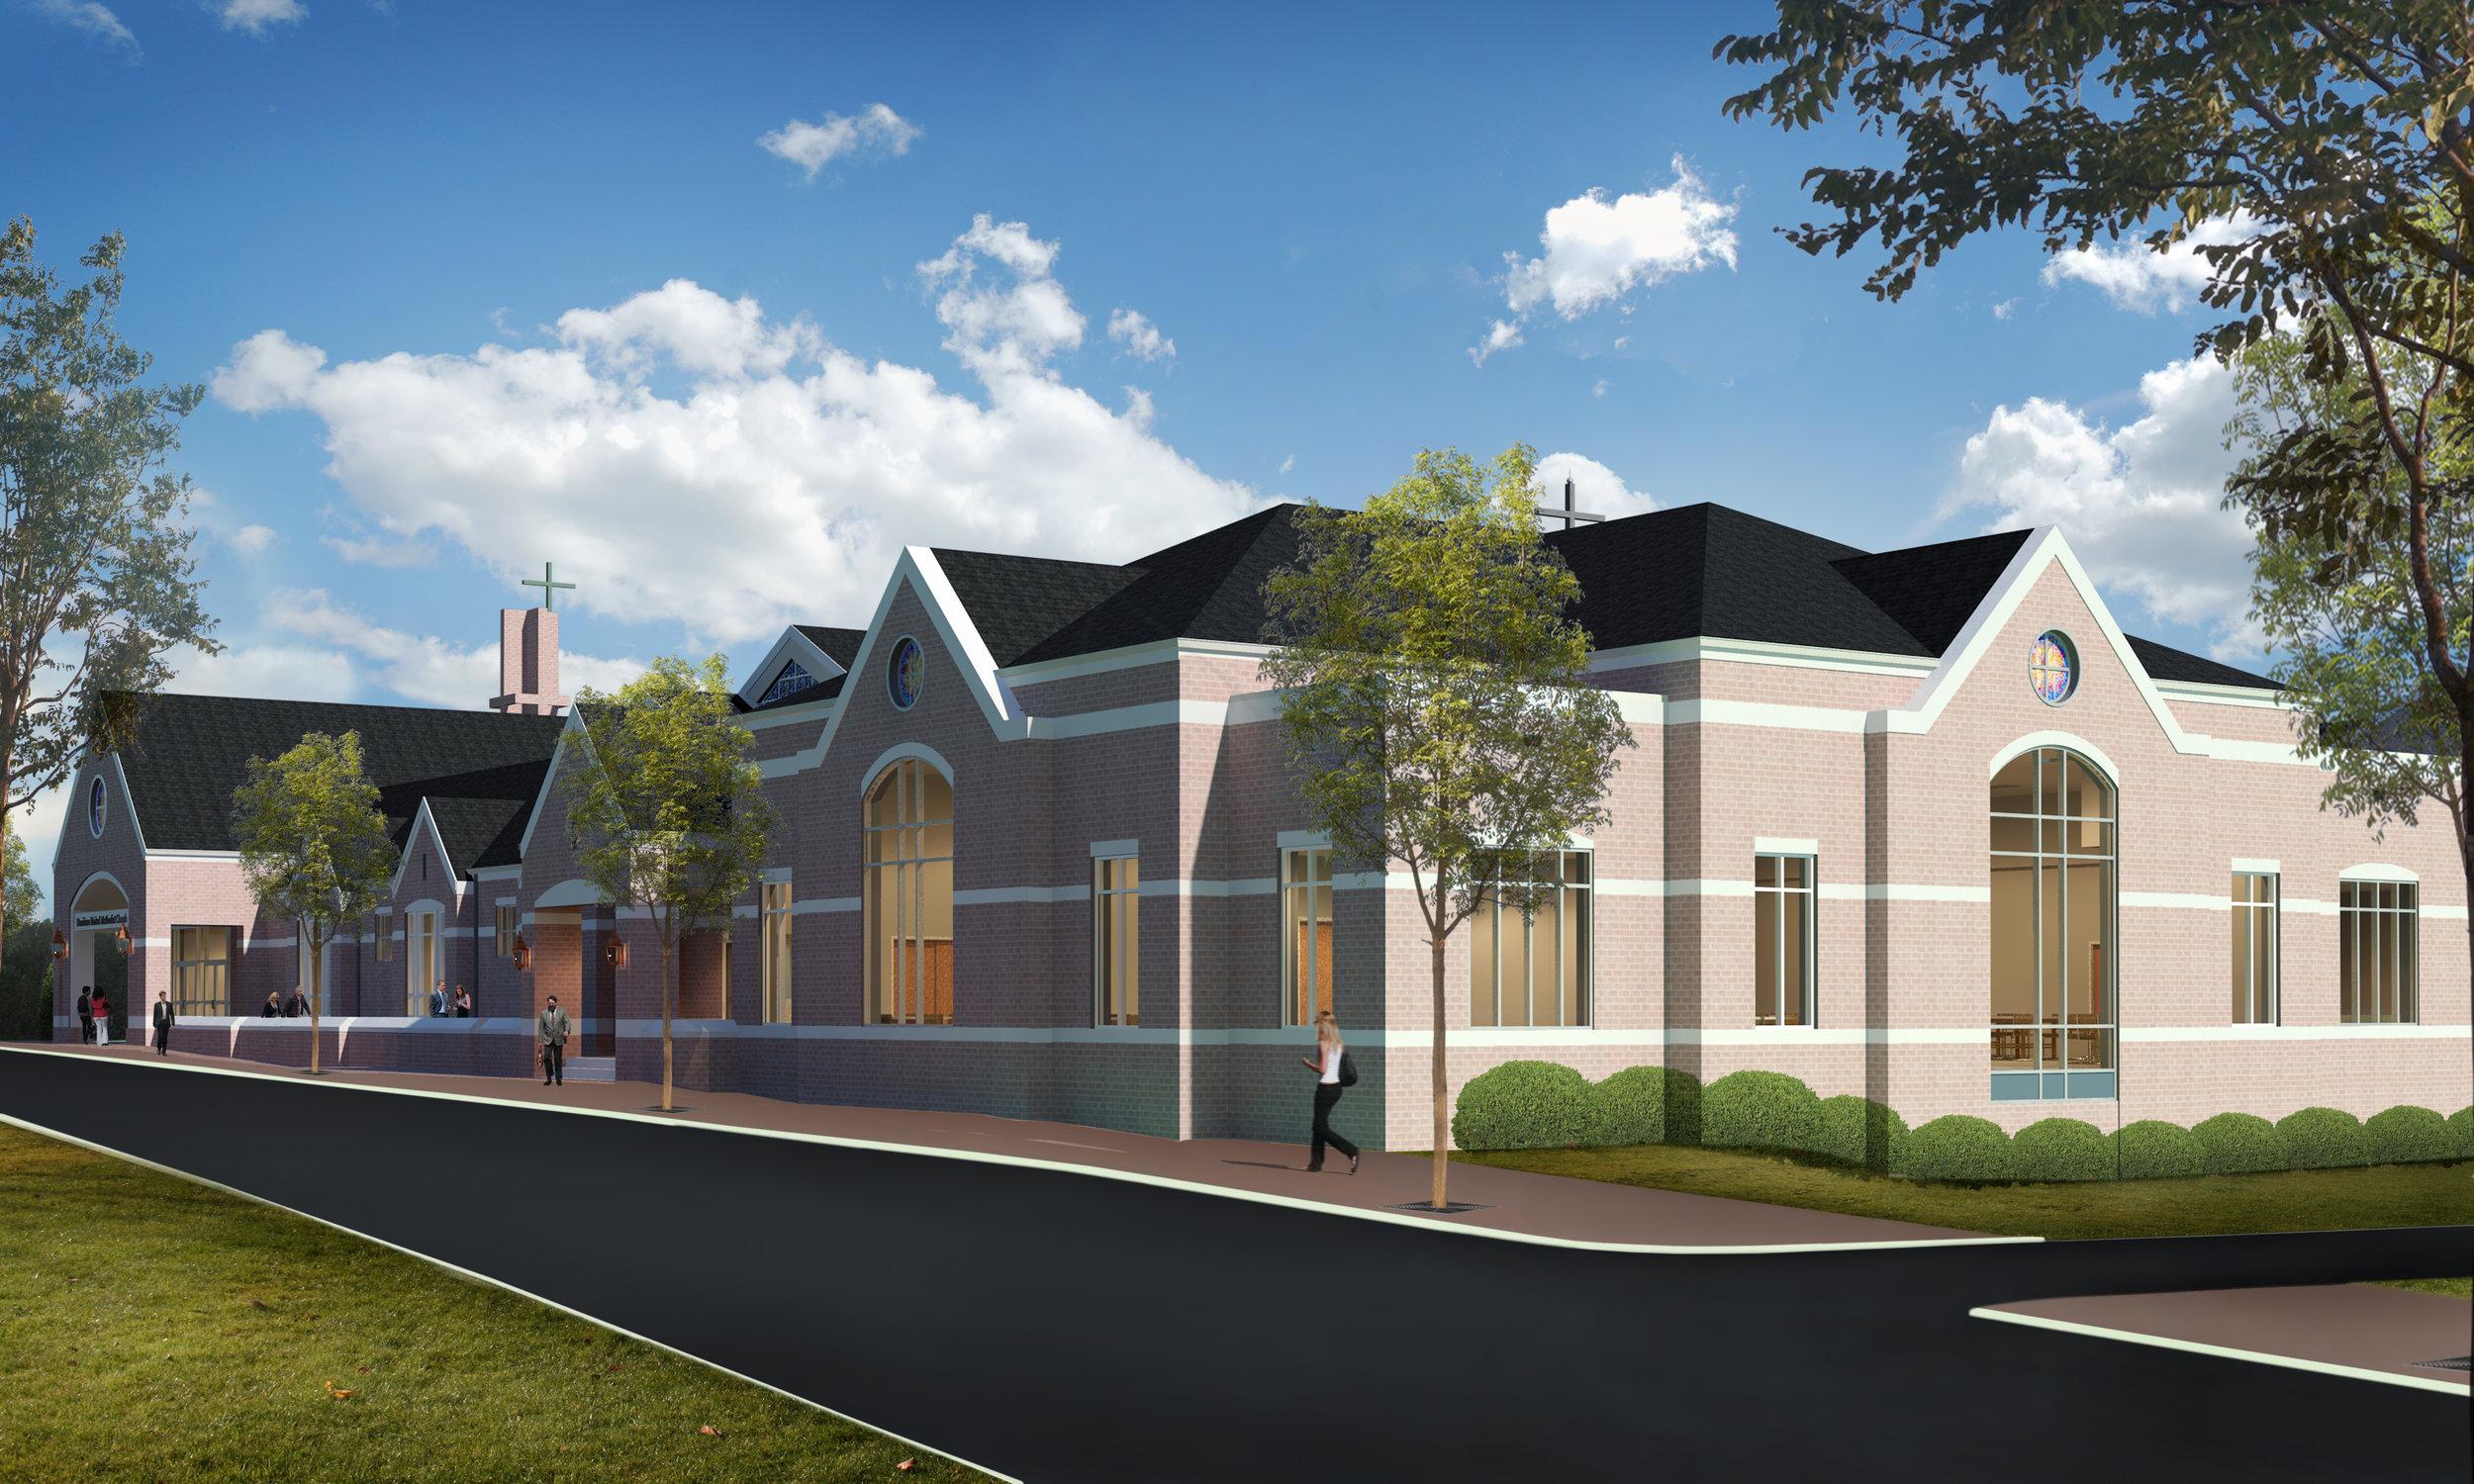 ADW-Faith-Based-Davidson-United-Methodist-Church-NC-Rendering-2.jpg